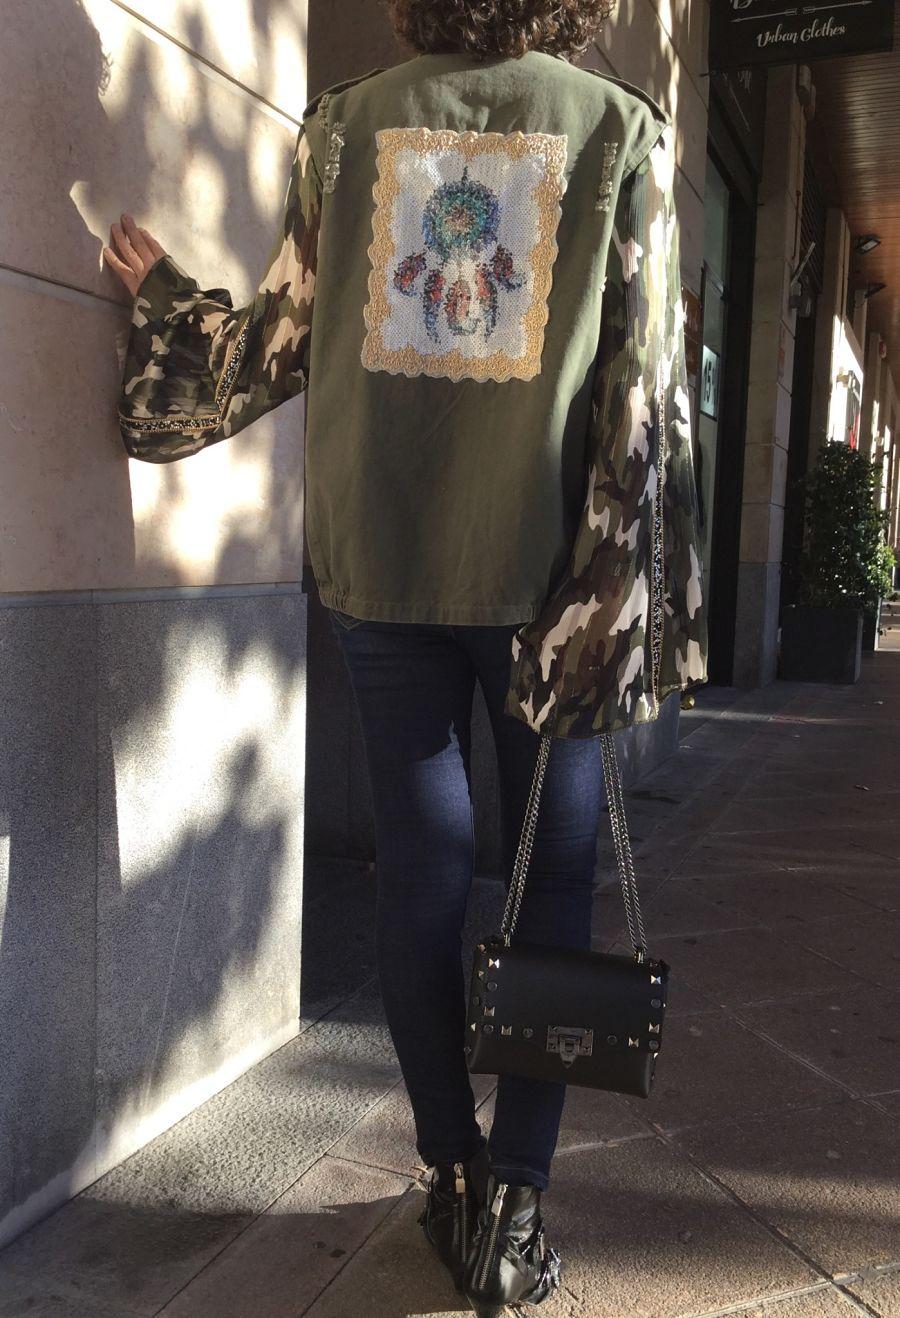 Rebeca Valdivia, asesora de imagen, asesora eventos, personal shopper, estilista, stilist, Donostia, San Sebastián, Miss Clov, tienda, boho & chic, boho style, accesorios, camisa militar